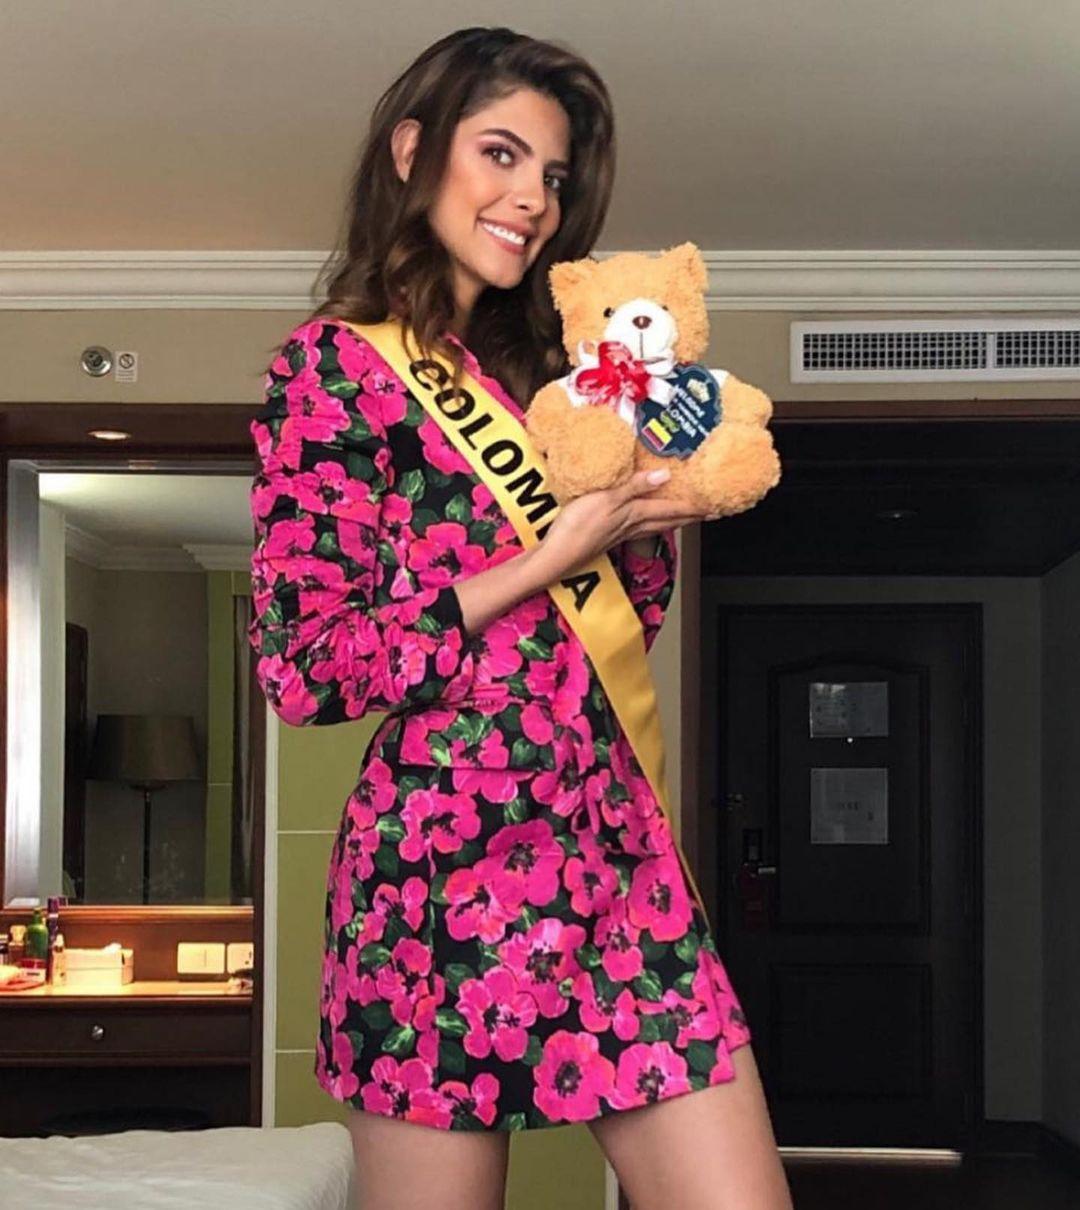 natalia manrique, miss grand colombia 2020. - Página 5 Q3qjdf10